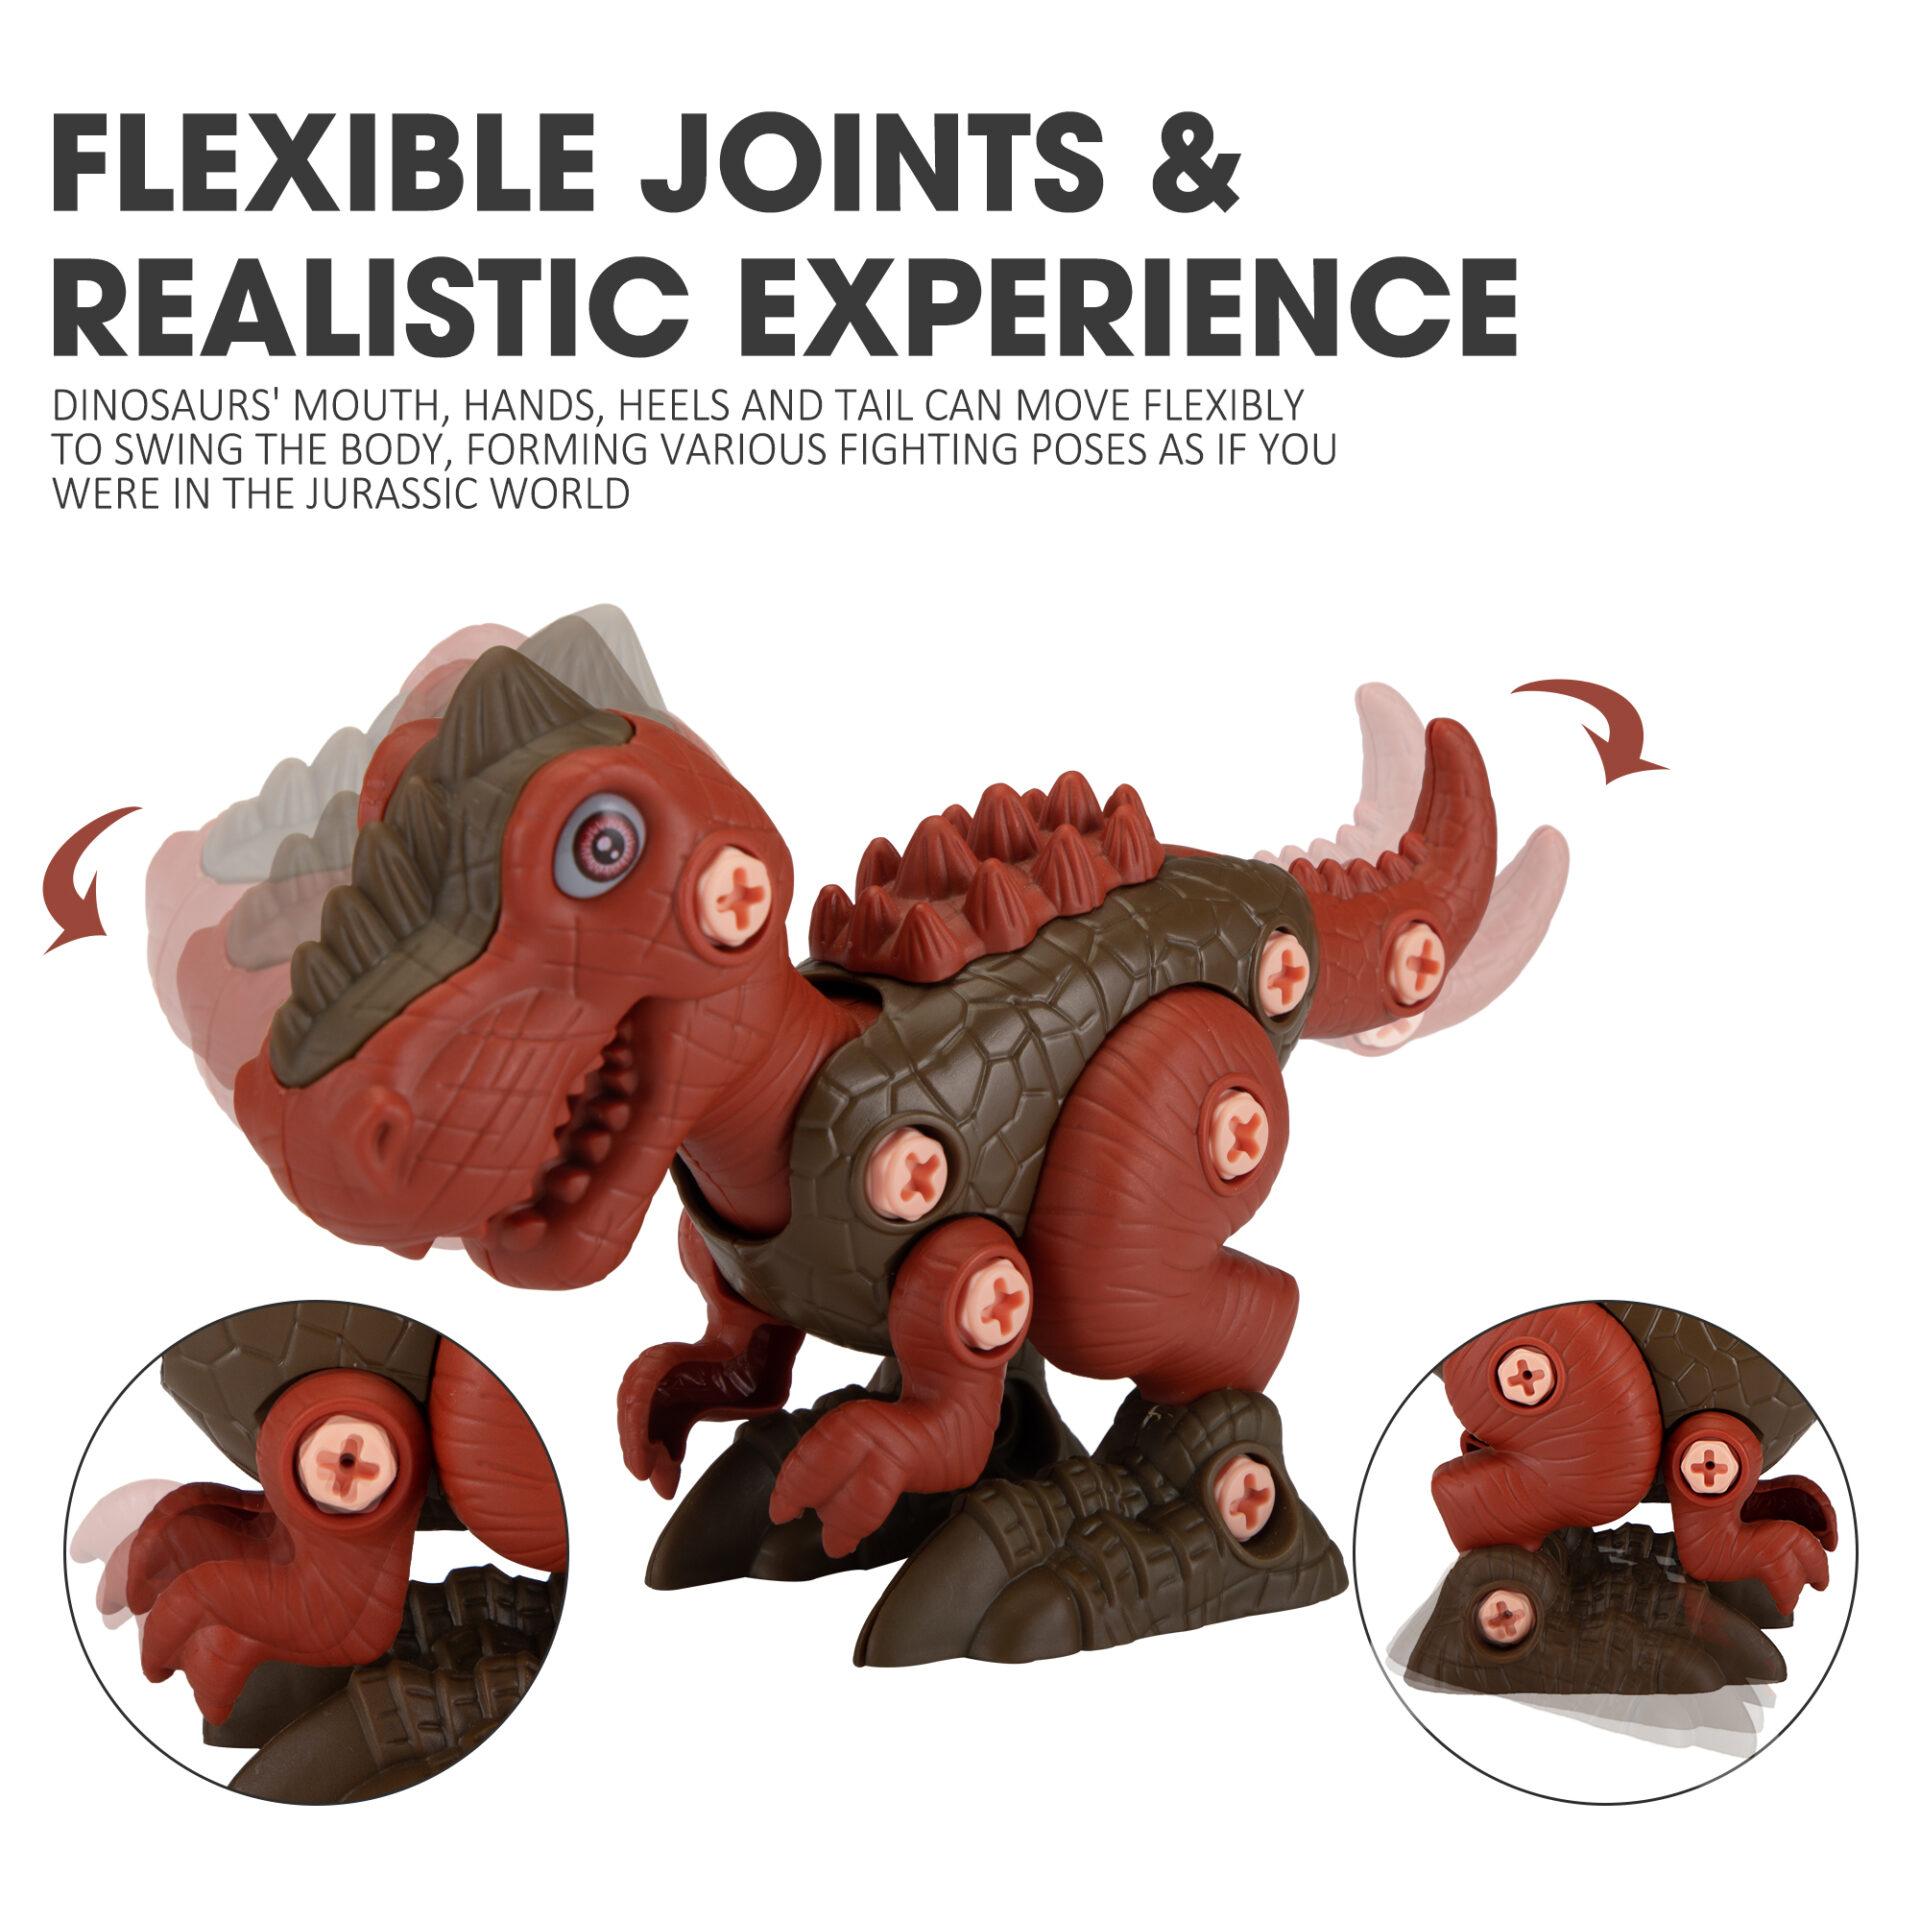 6 Packs DIY Building Dinosaur Toys Set 5 3